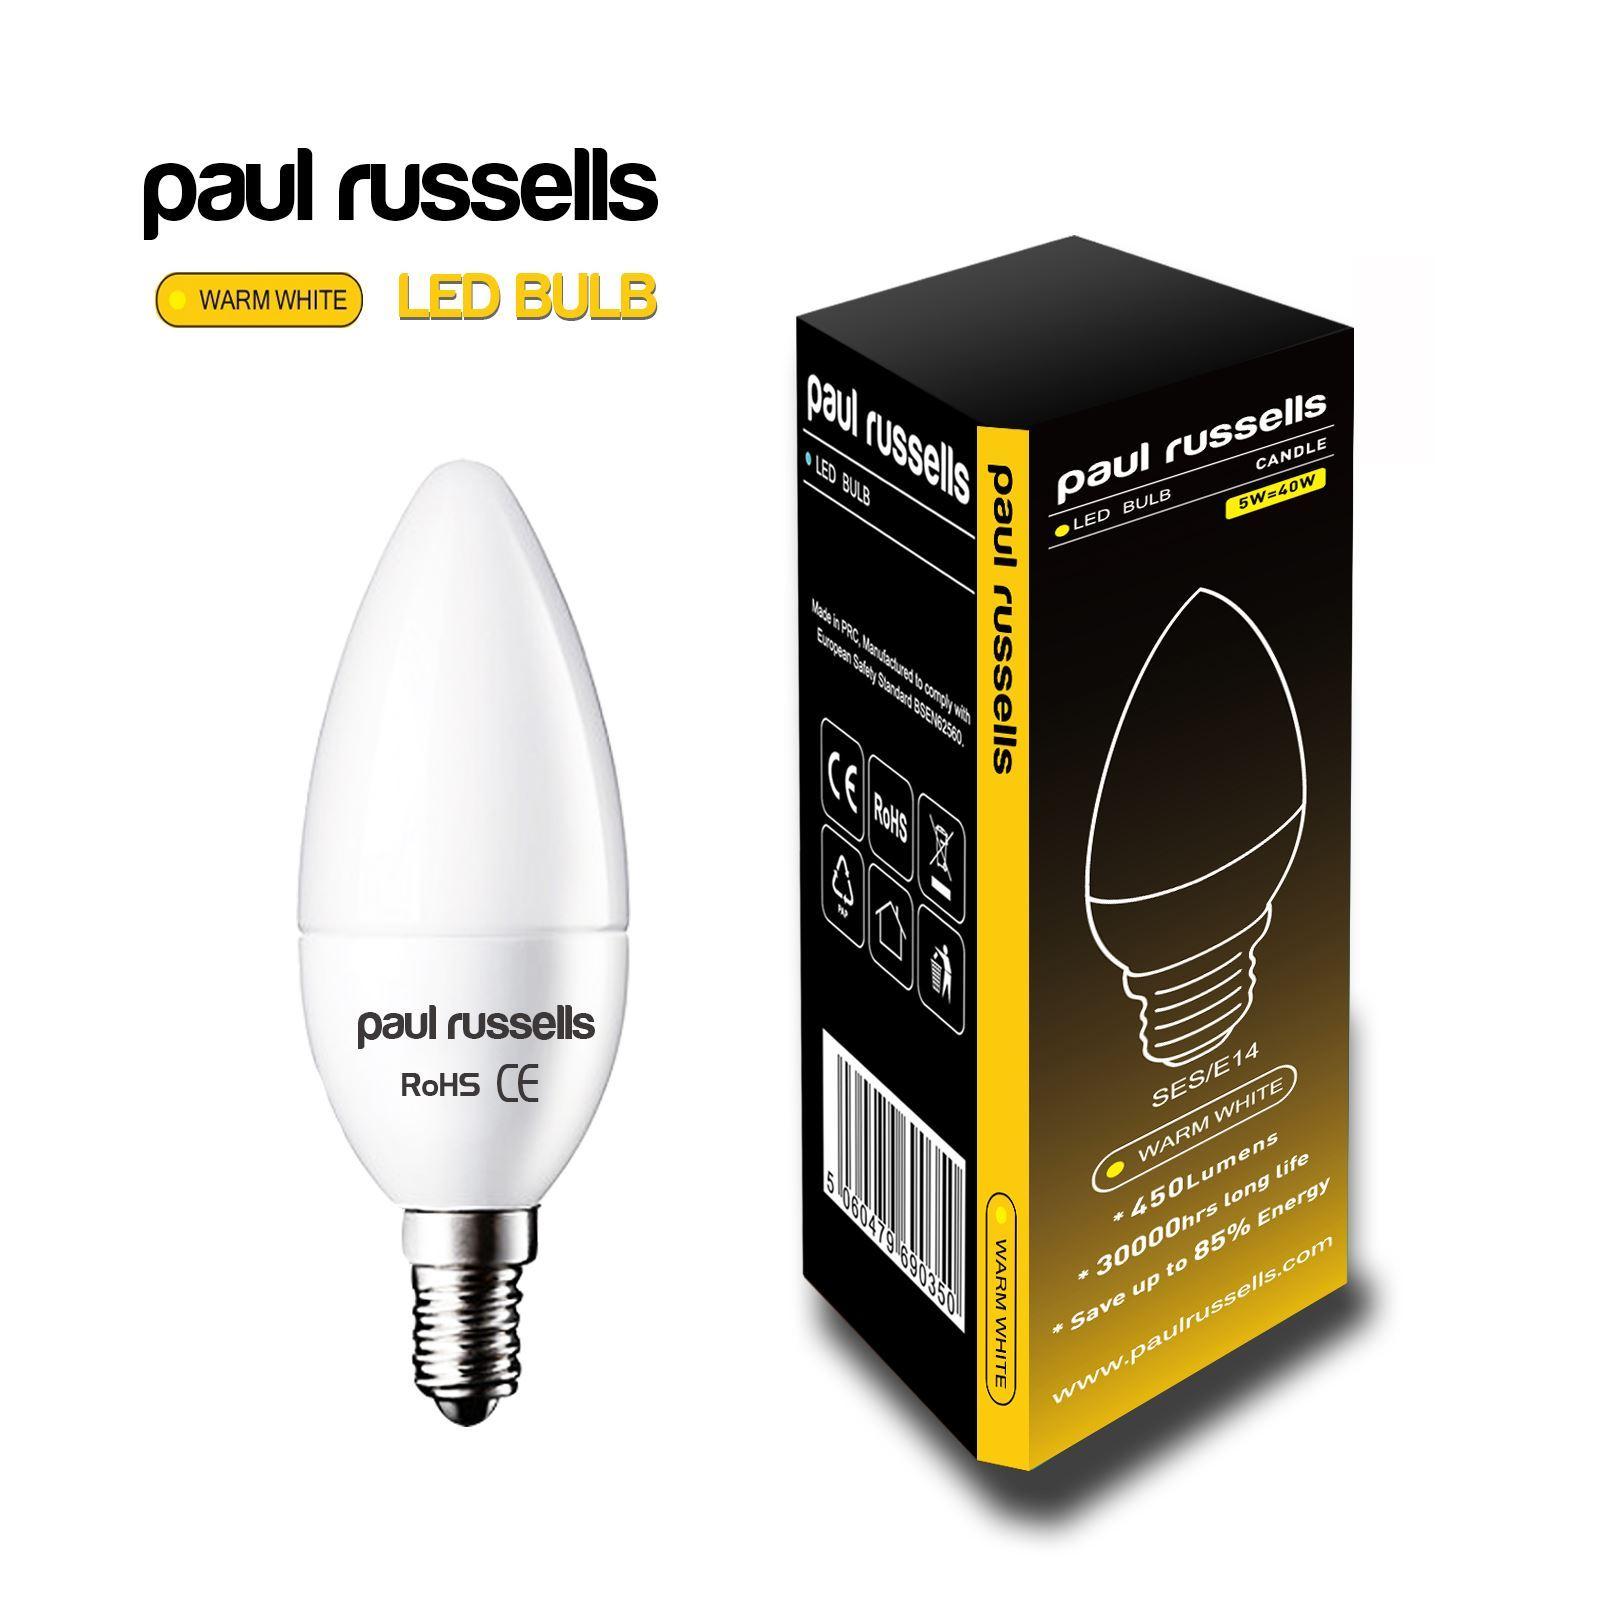 led 25w 40w 60w 100w bc b22 es e27 ses e14 gls lamp light bulbs day warm white. Black Bedroom Furniture Sets. Home Design Ideas